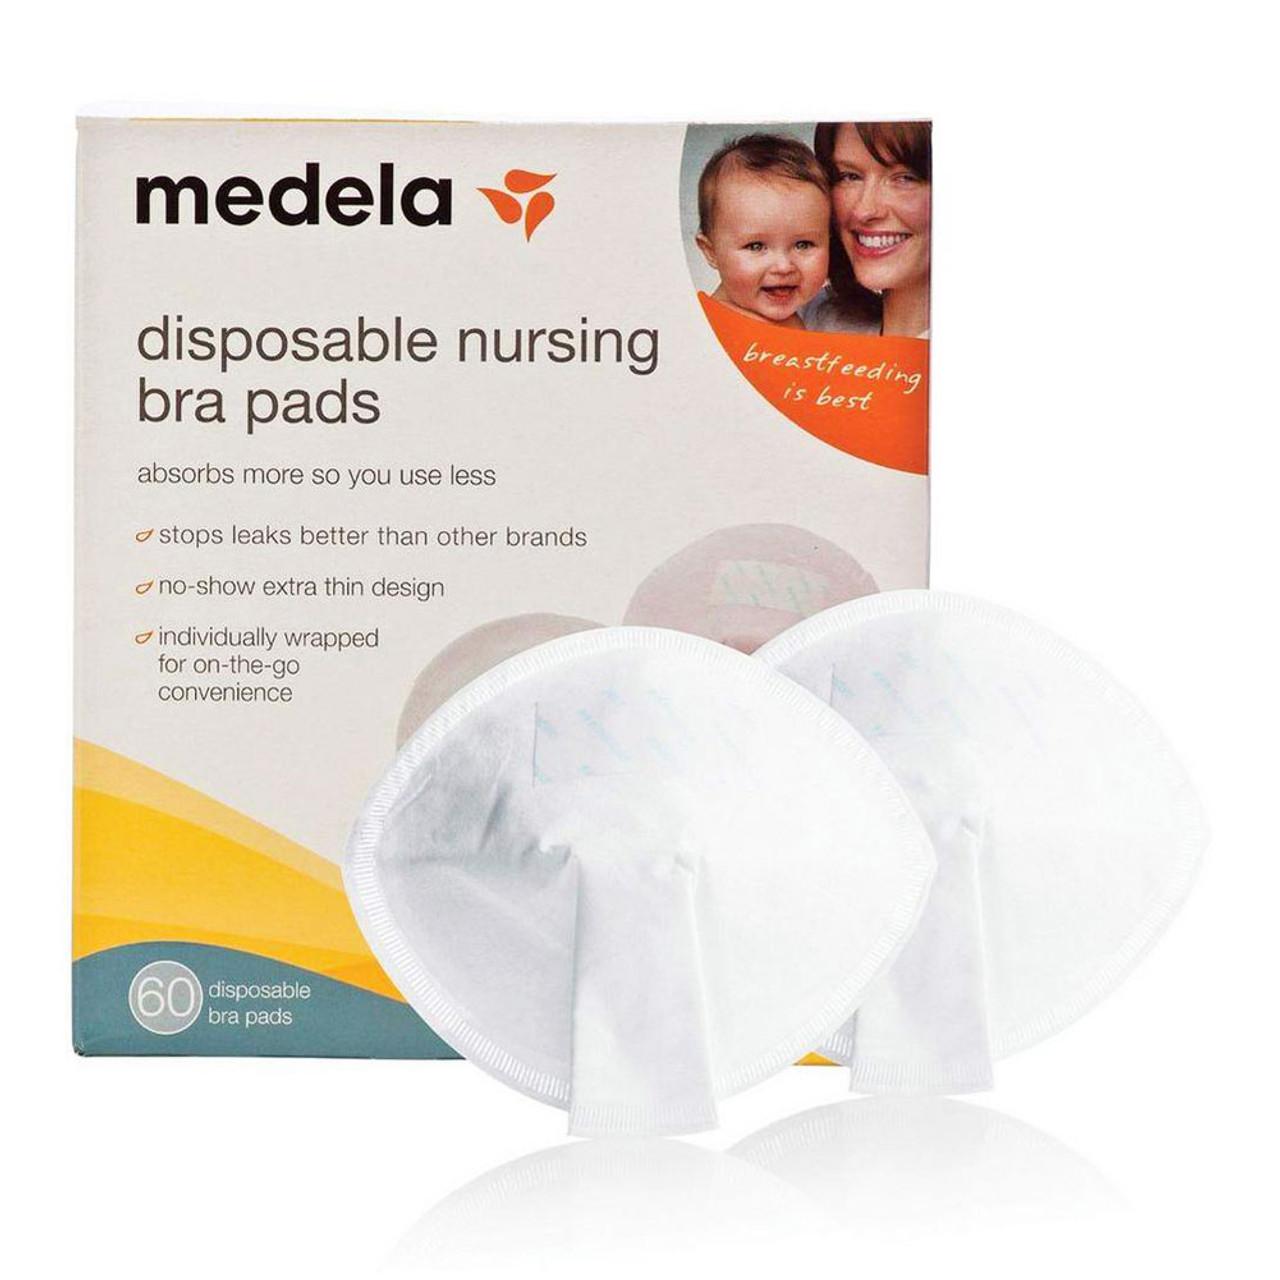 8c9dd02cf4 Medela Disposable Nursing Bra Pads - 60 Pads - Dear-Born Baby